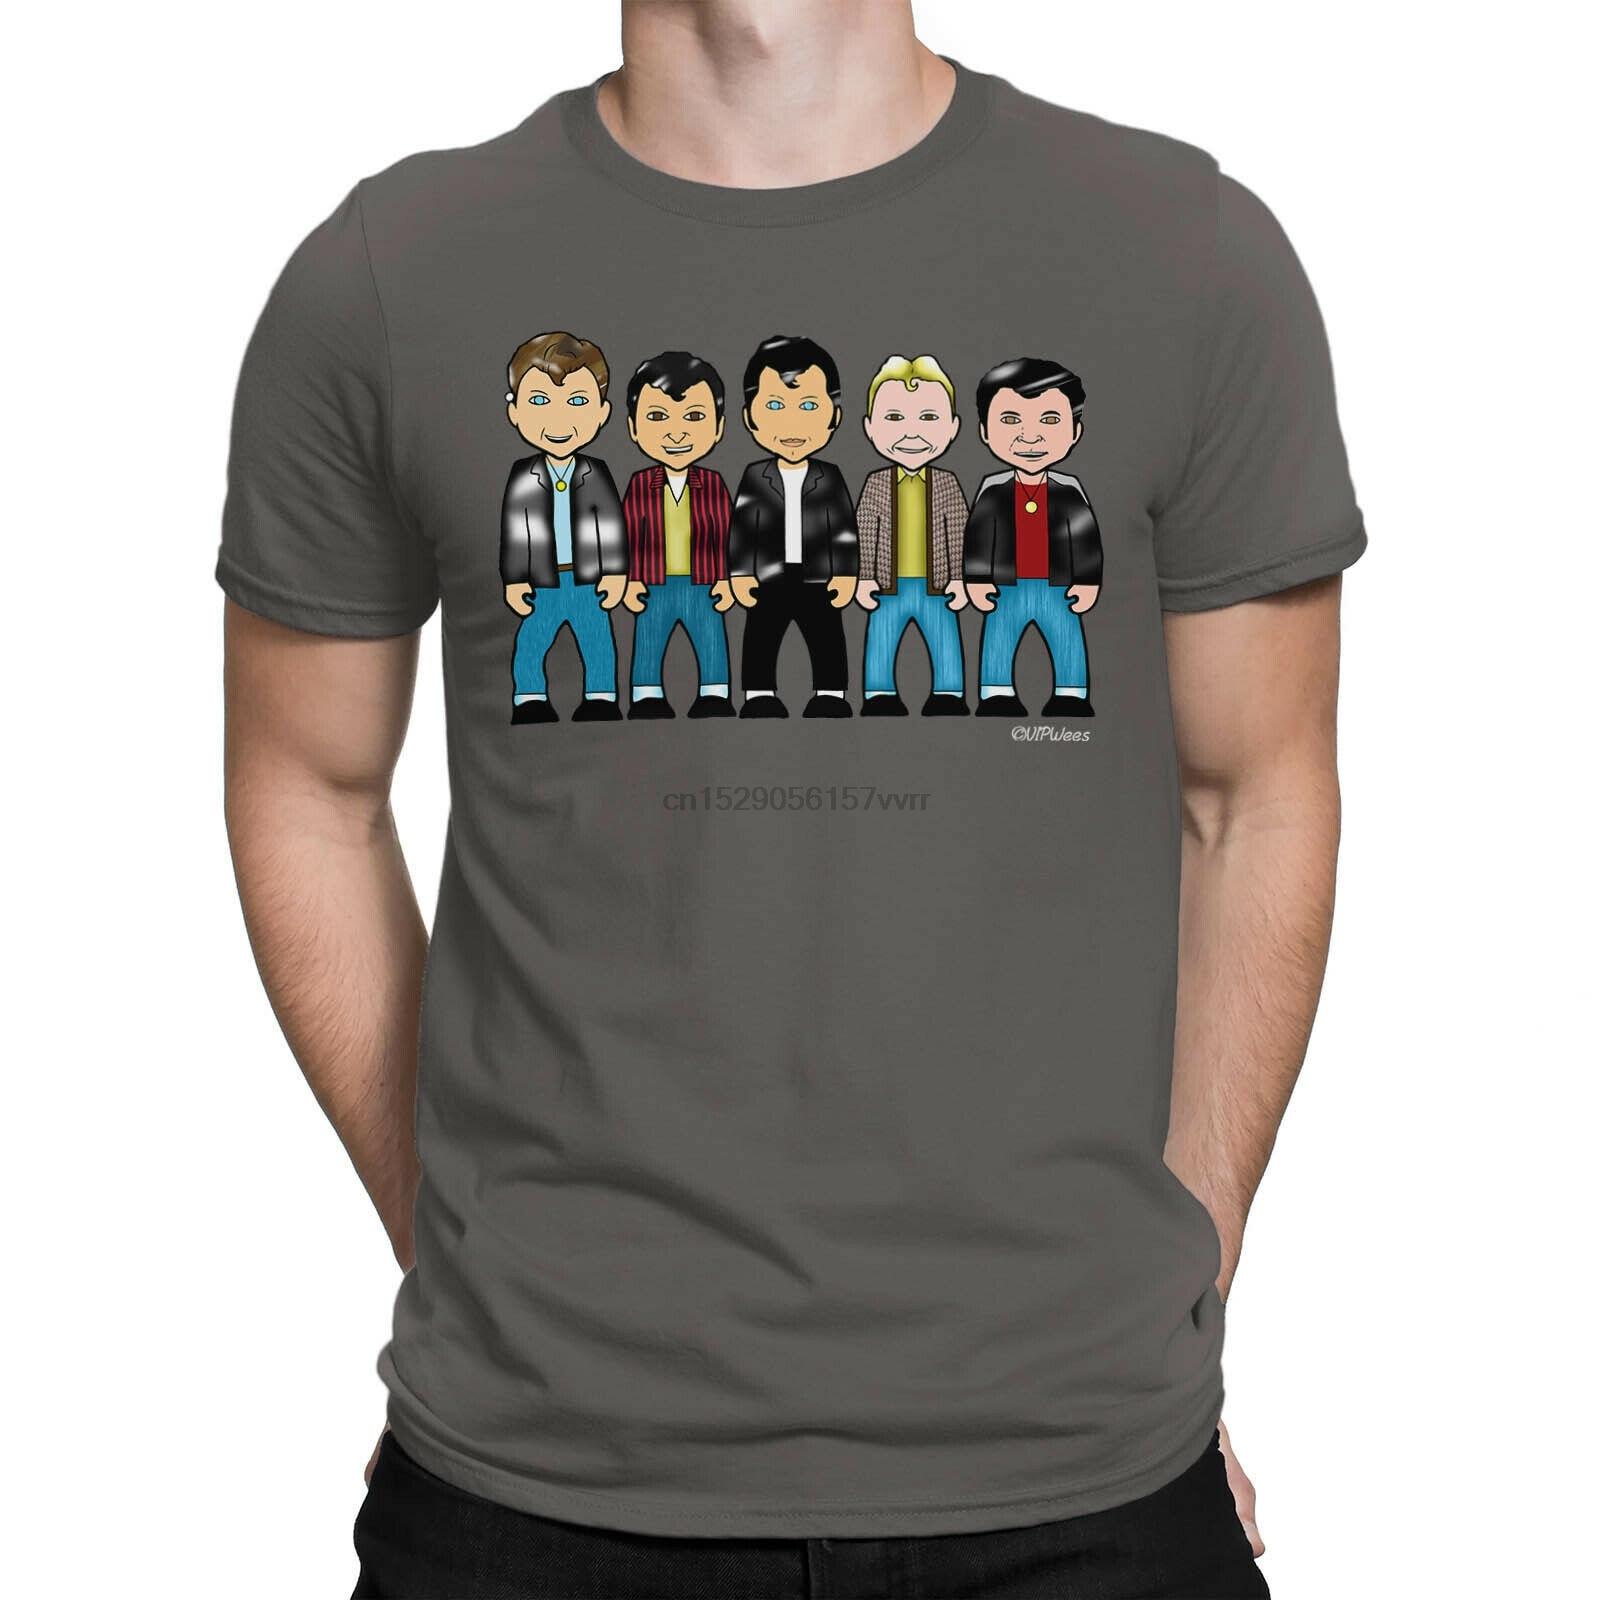 Kids VIPwees T-Shirt Formula 1 Legends Boys Girls F1 Motorsport Racing Gift Top